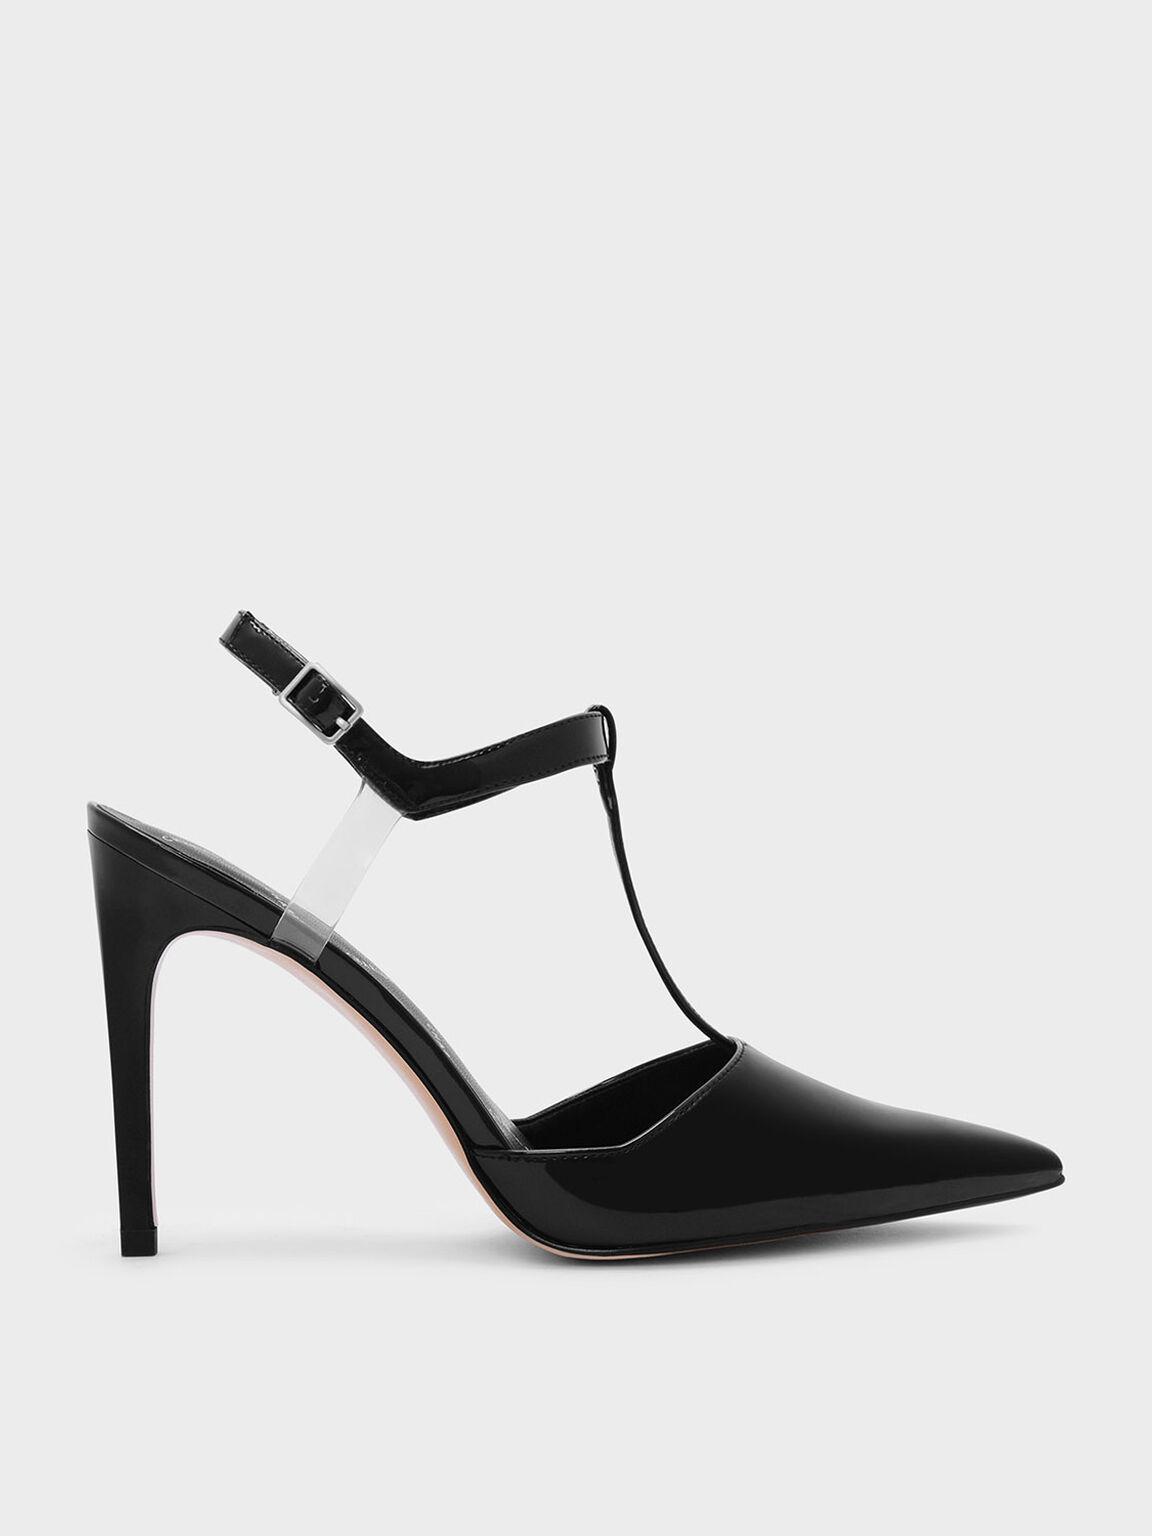 T-Bar Pointed Heels, Black, hi-res